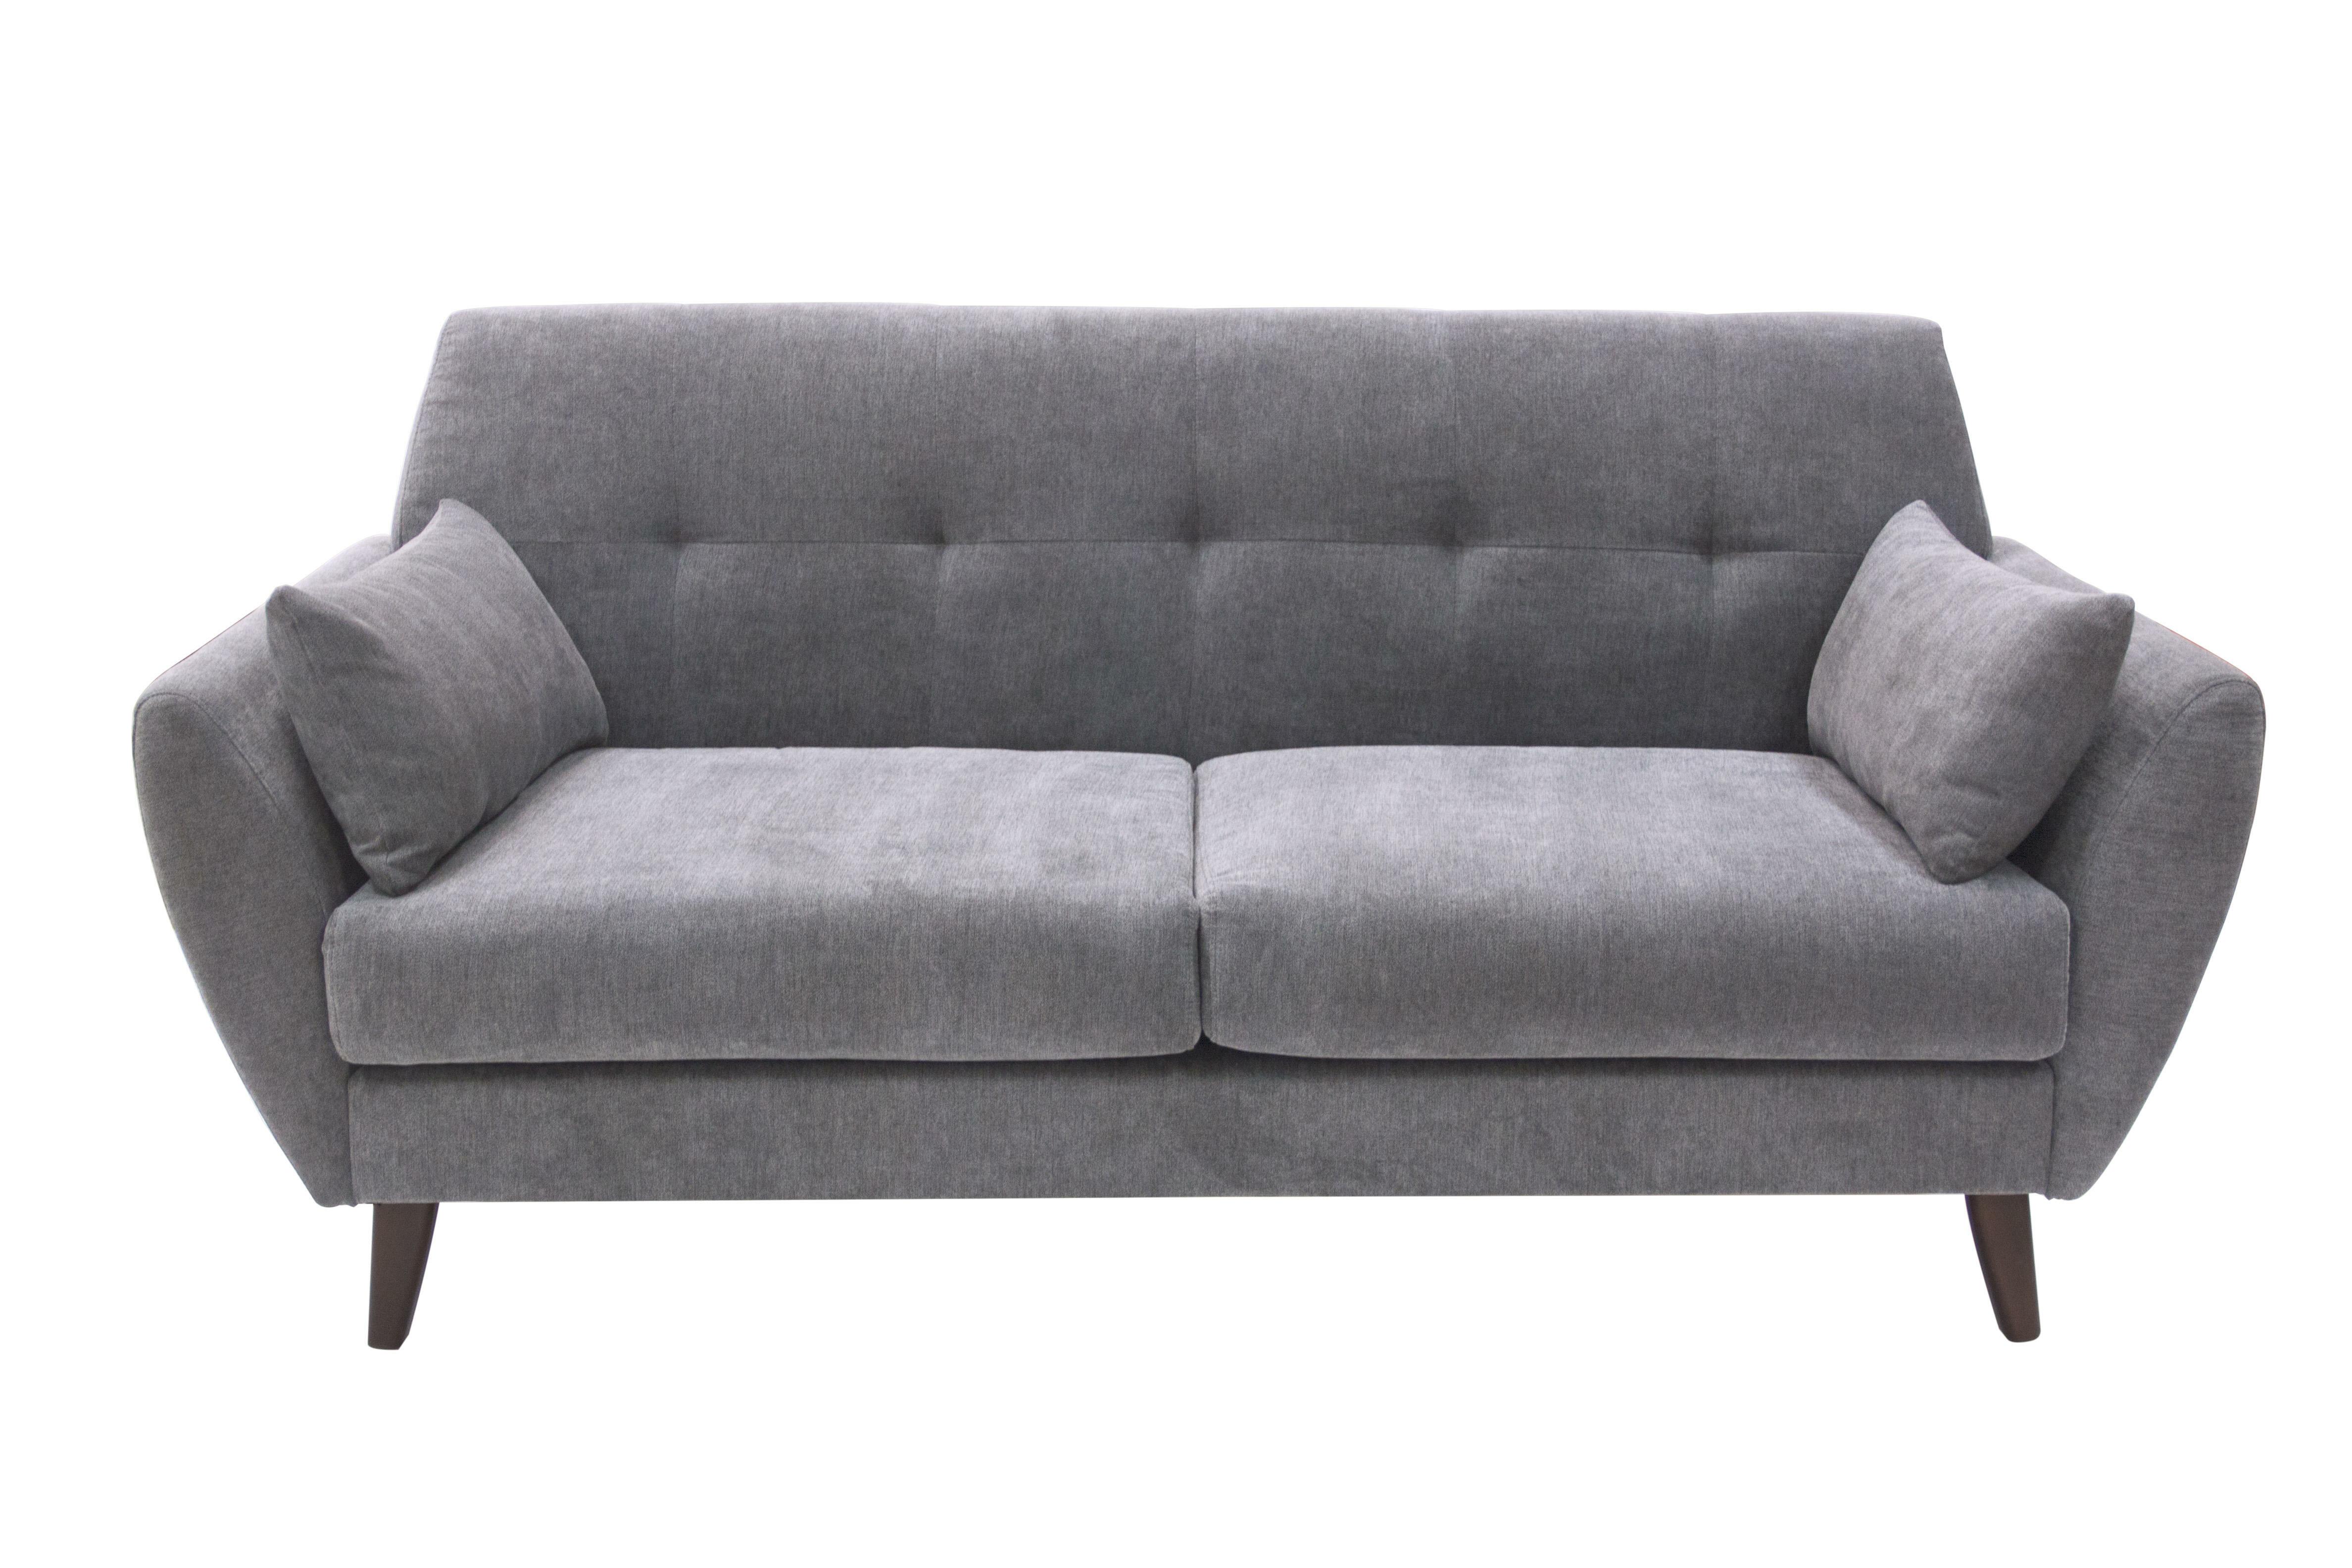 Elle Decor Amelie Mid Century Modern Sofa U0026 Reviews | Wayfair